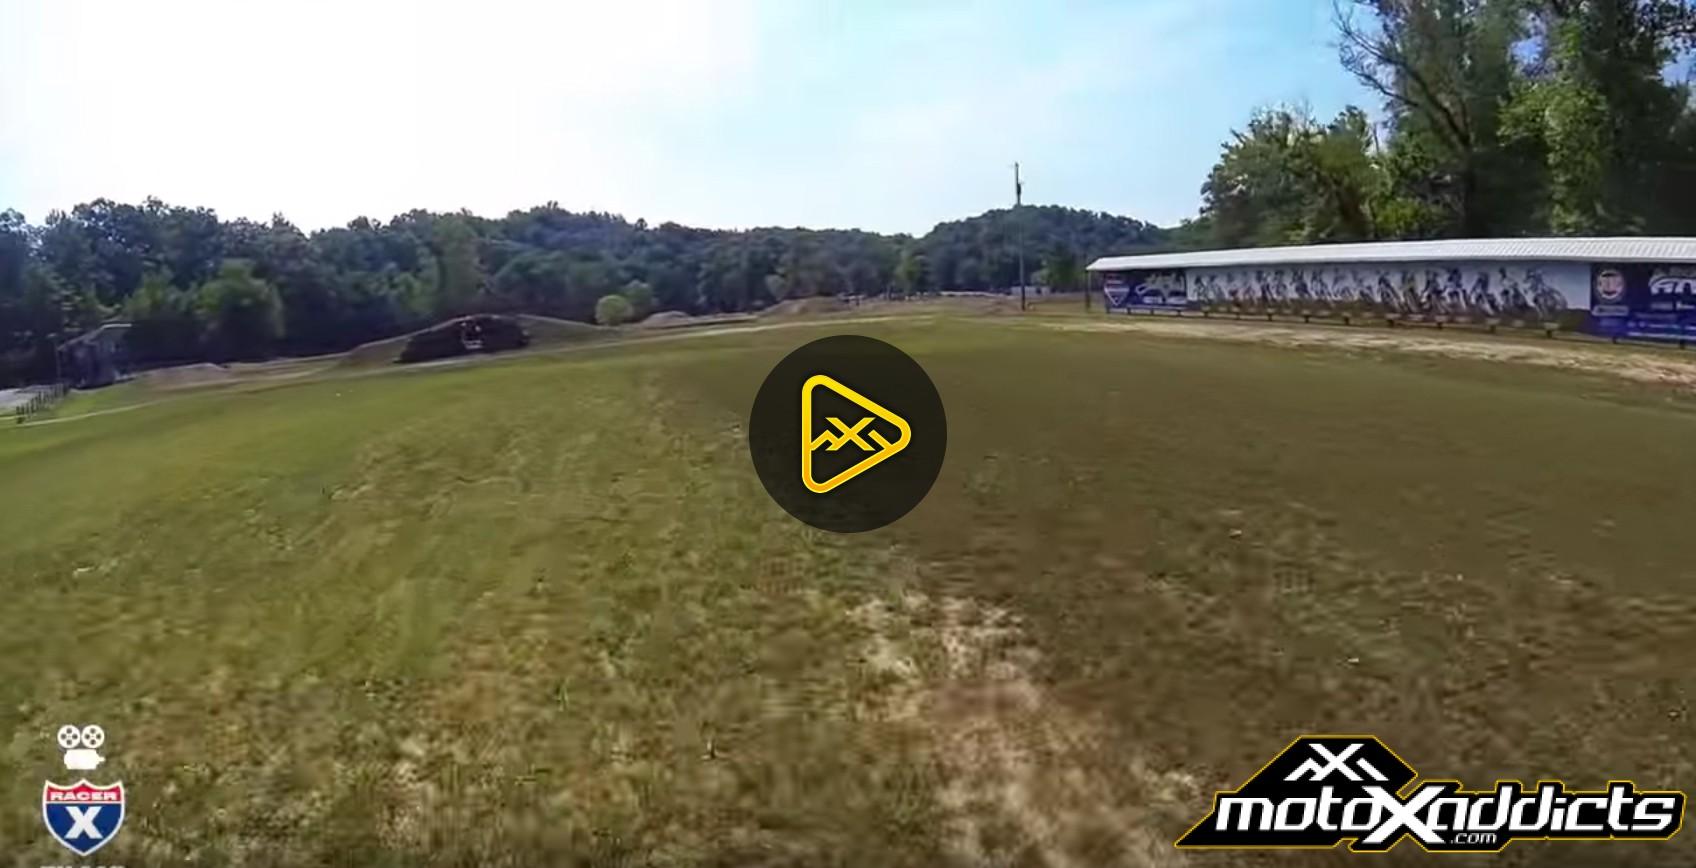 Helmet Cam: 2016 Loretta Lynn's Track Preview on a Grom